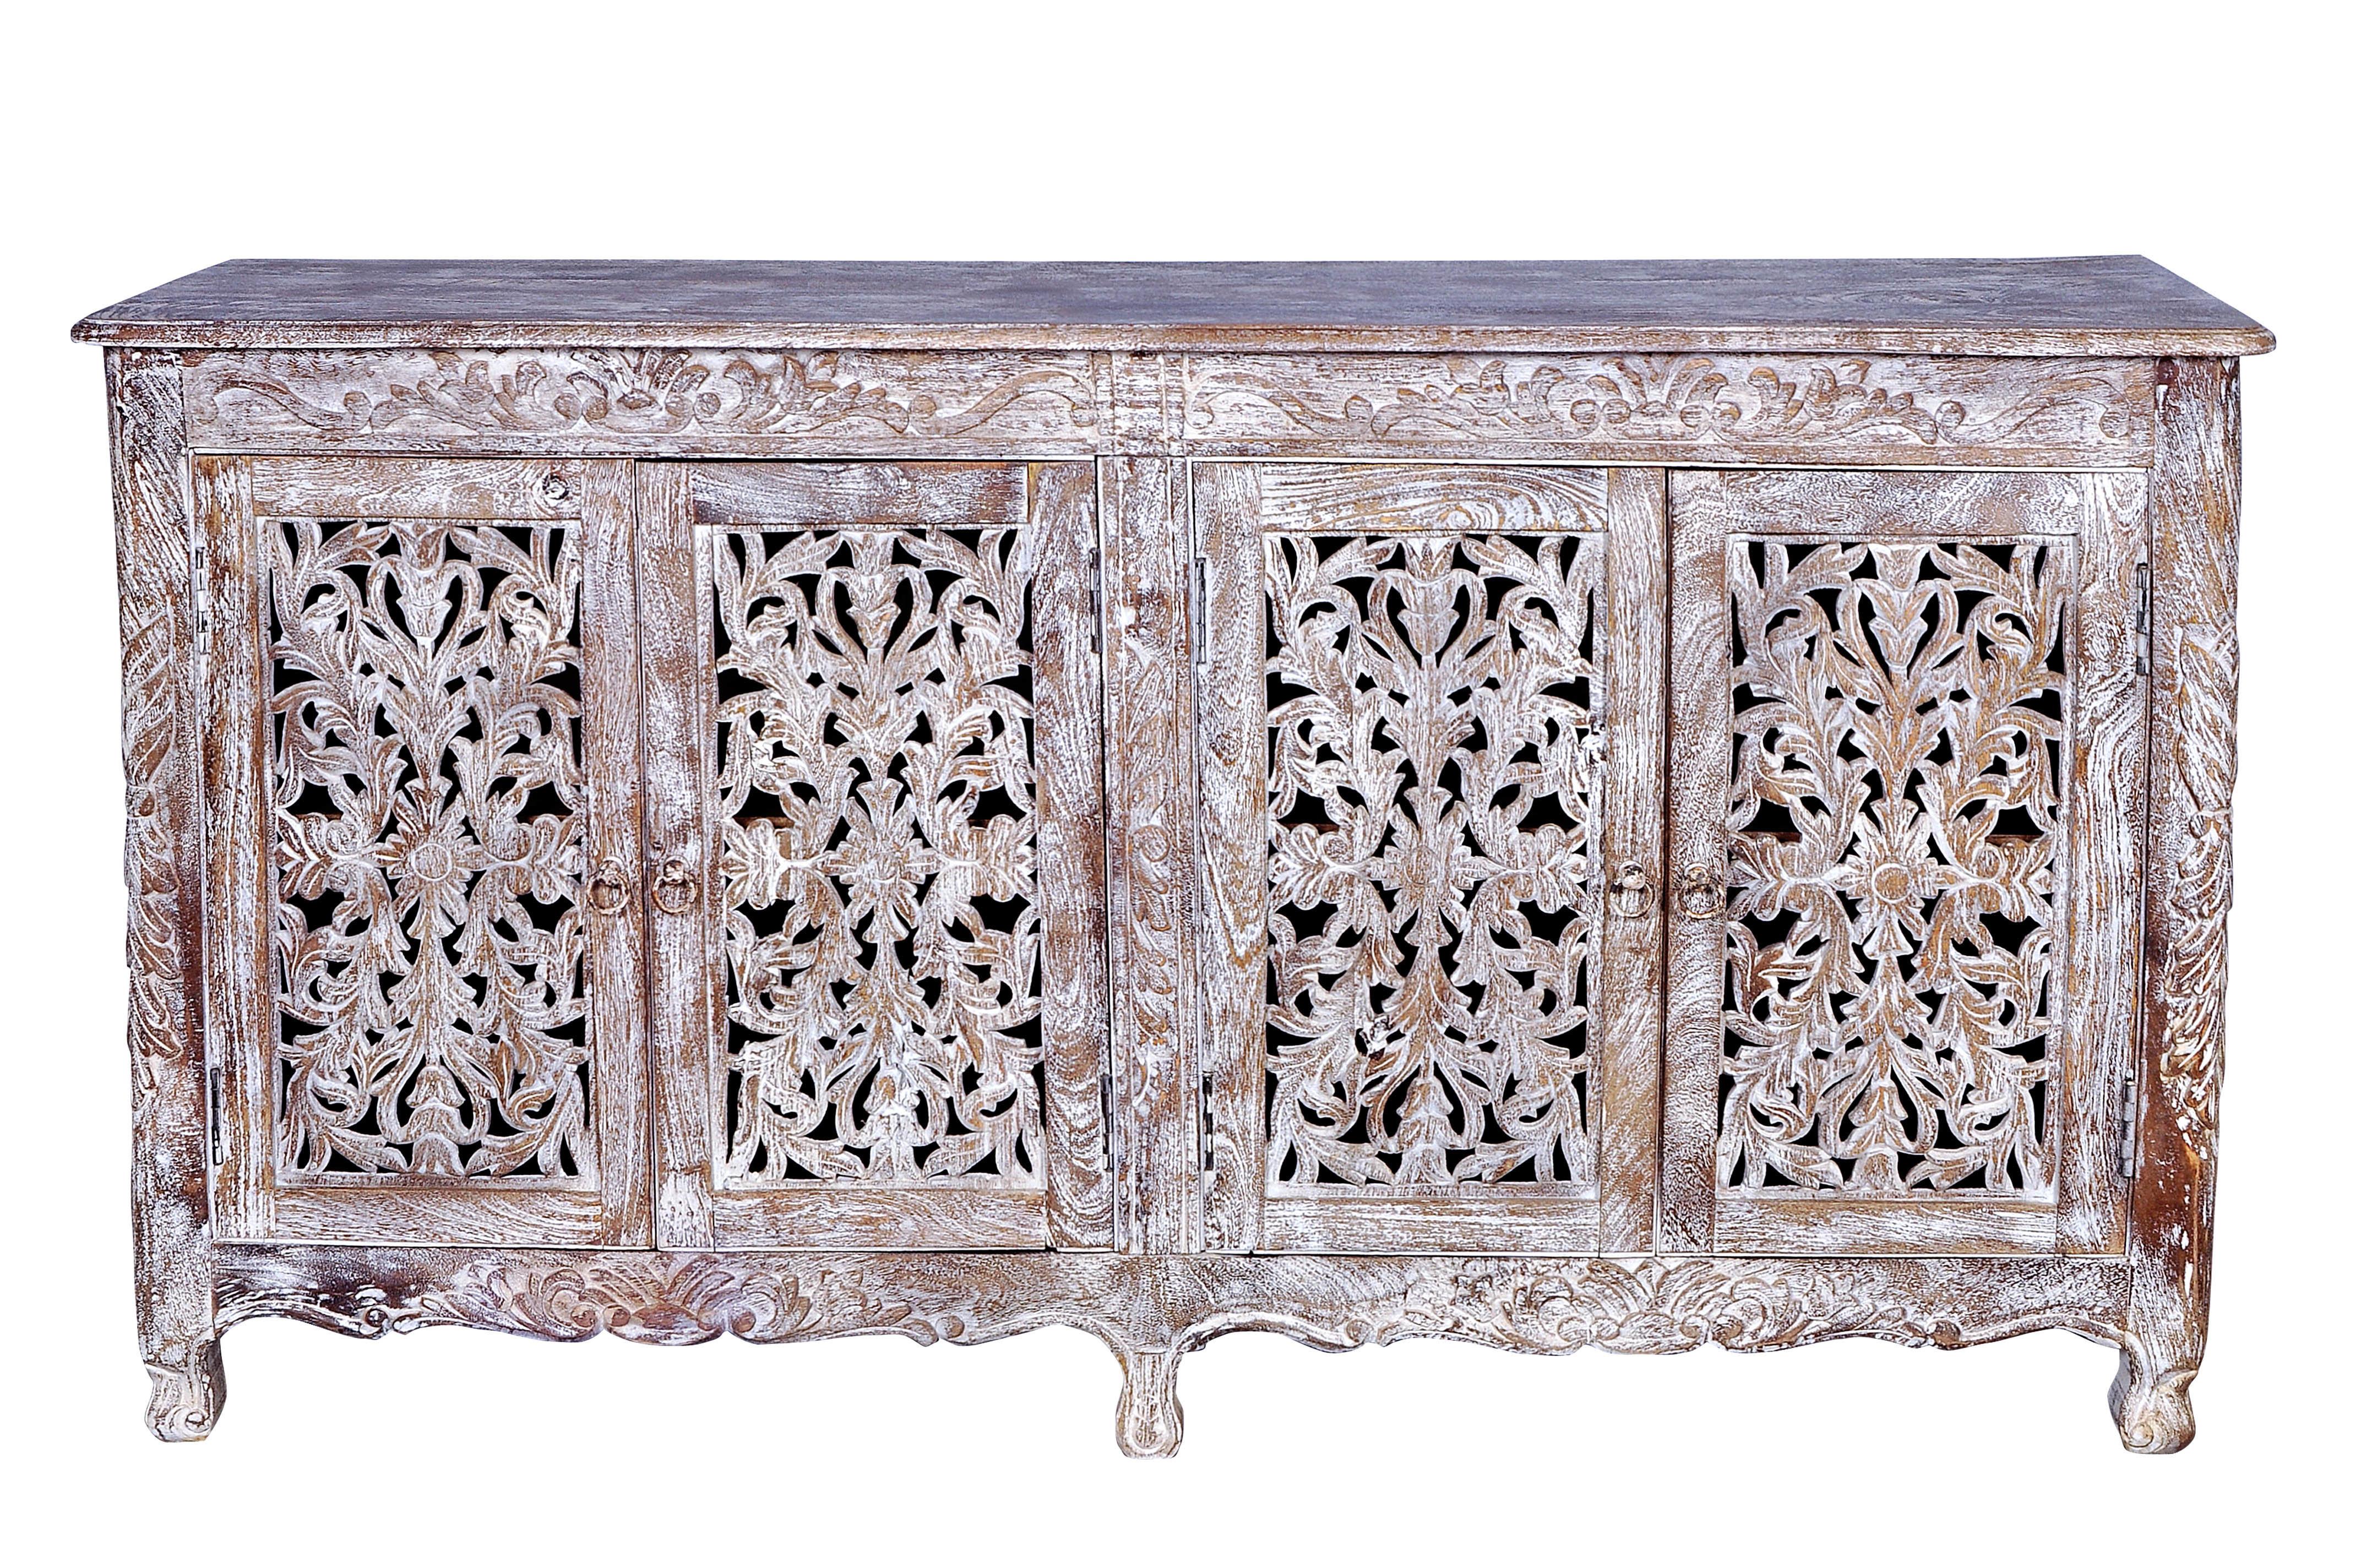 Bungalow Rose Aveliss Carved 4 Door Antique Whitewash Sideboard Regarding Most Recent White Wash 4 Door Sideboards (Gallery 5 of 20)